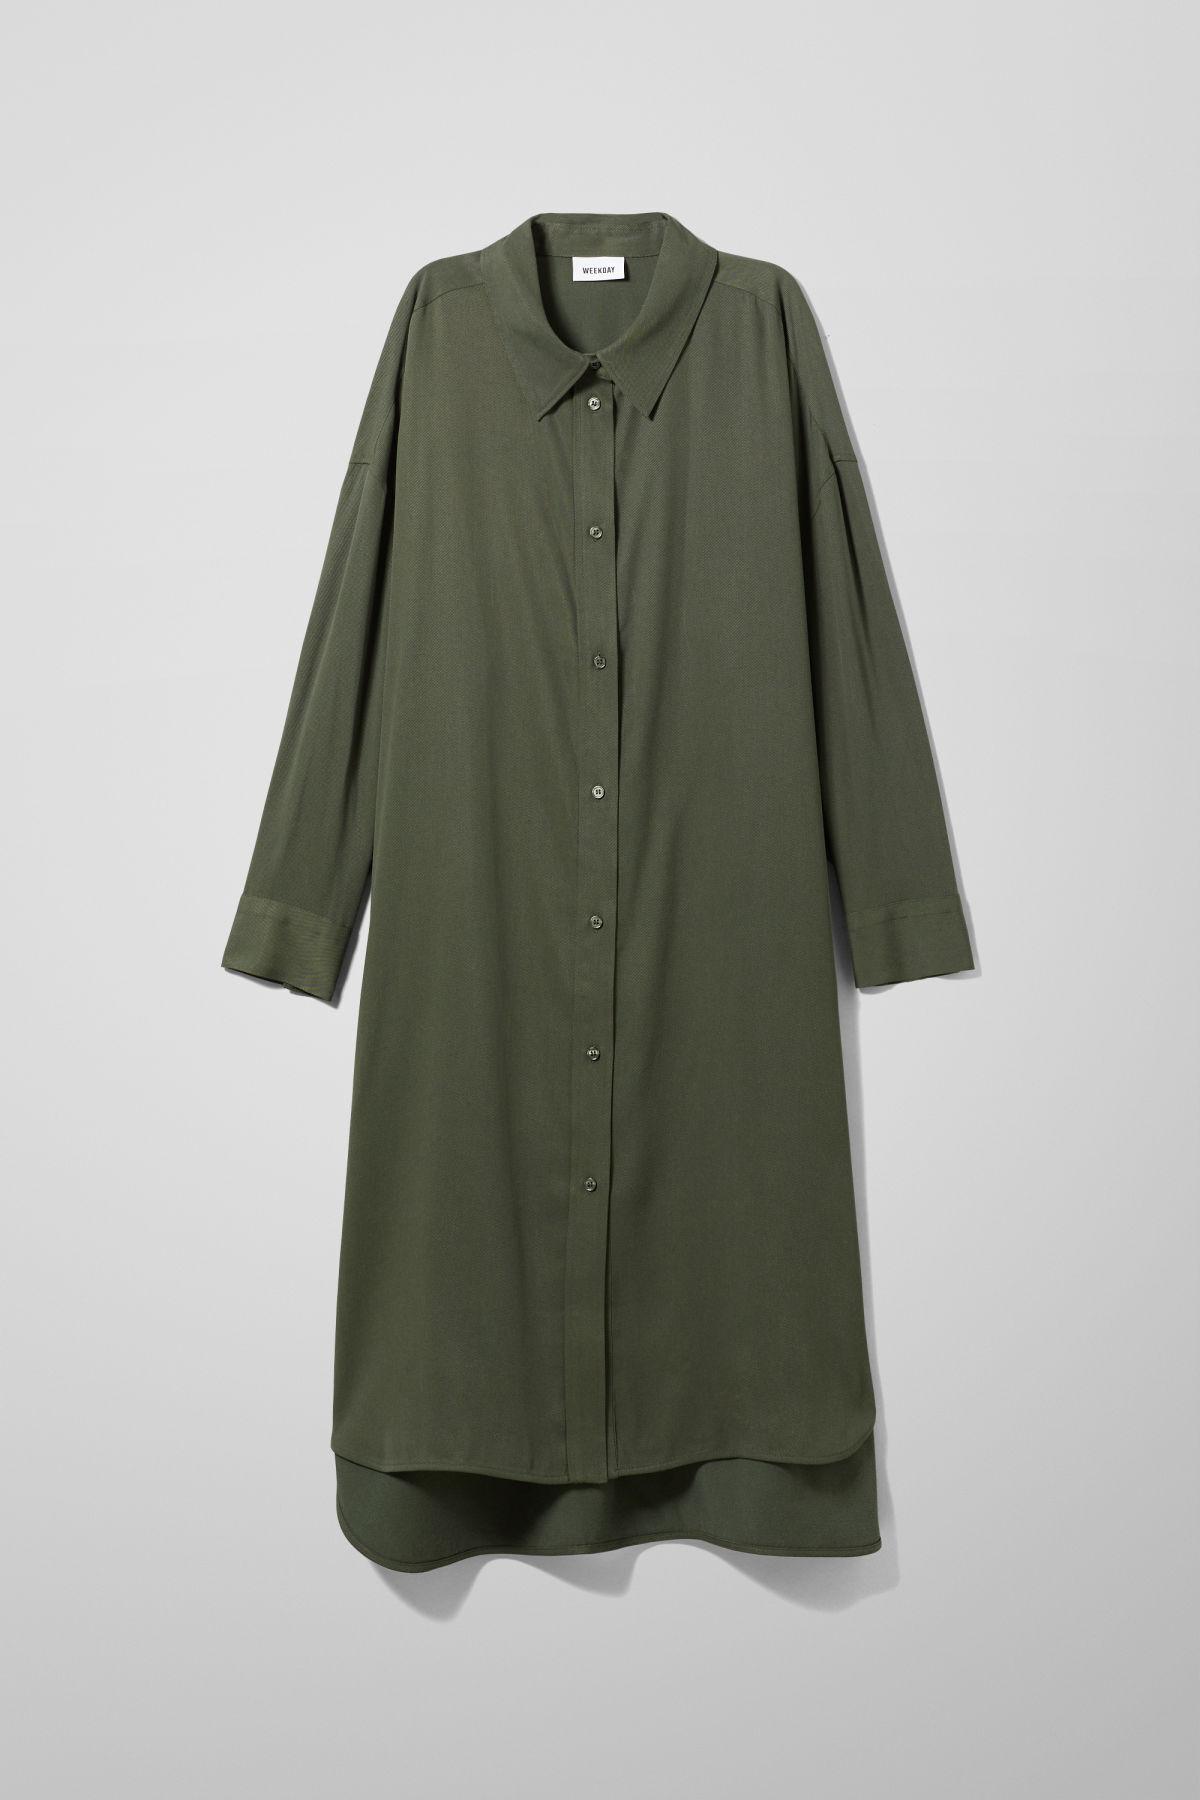 Image of Gladys Shirt Dress - Green-XS